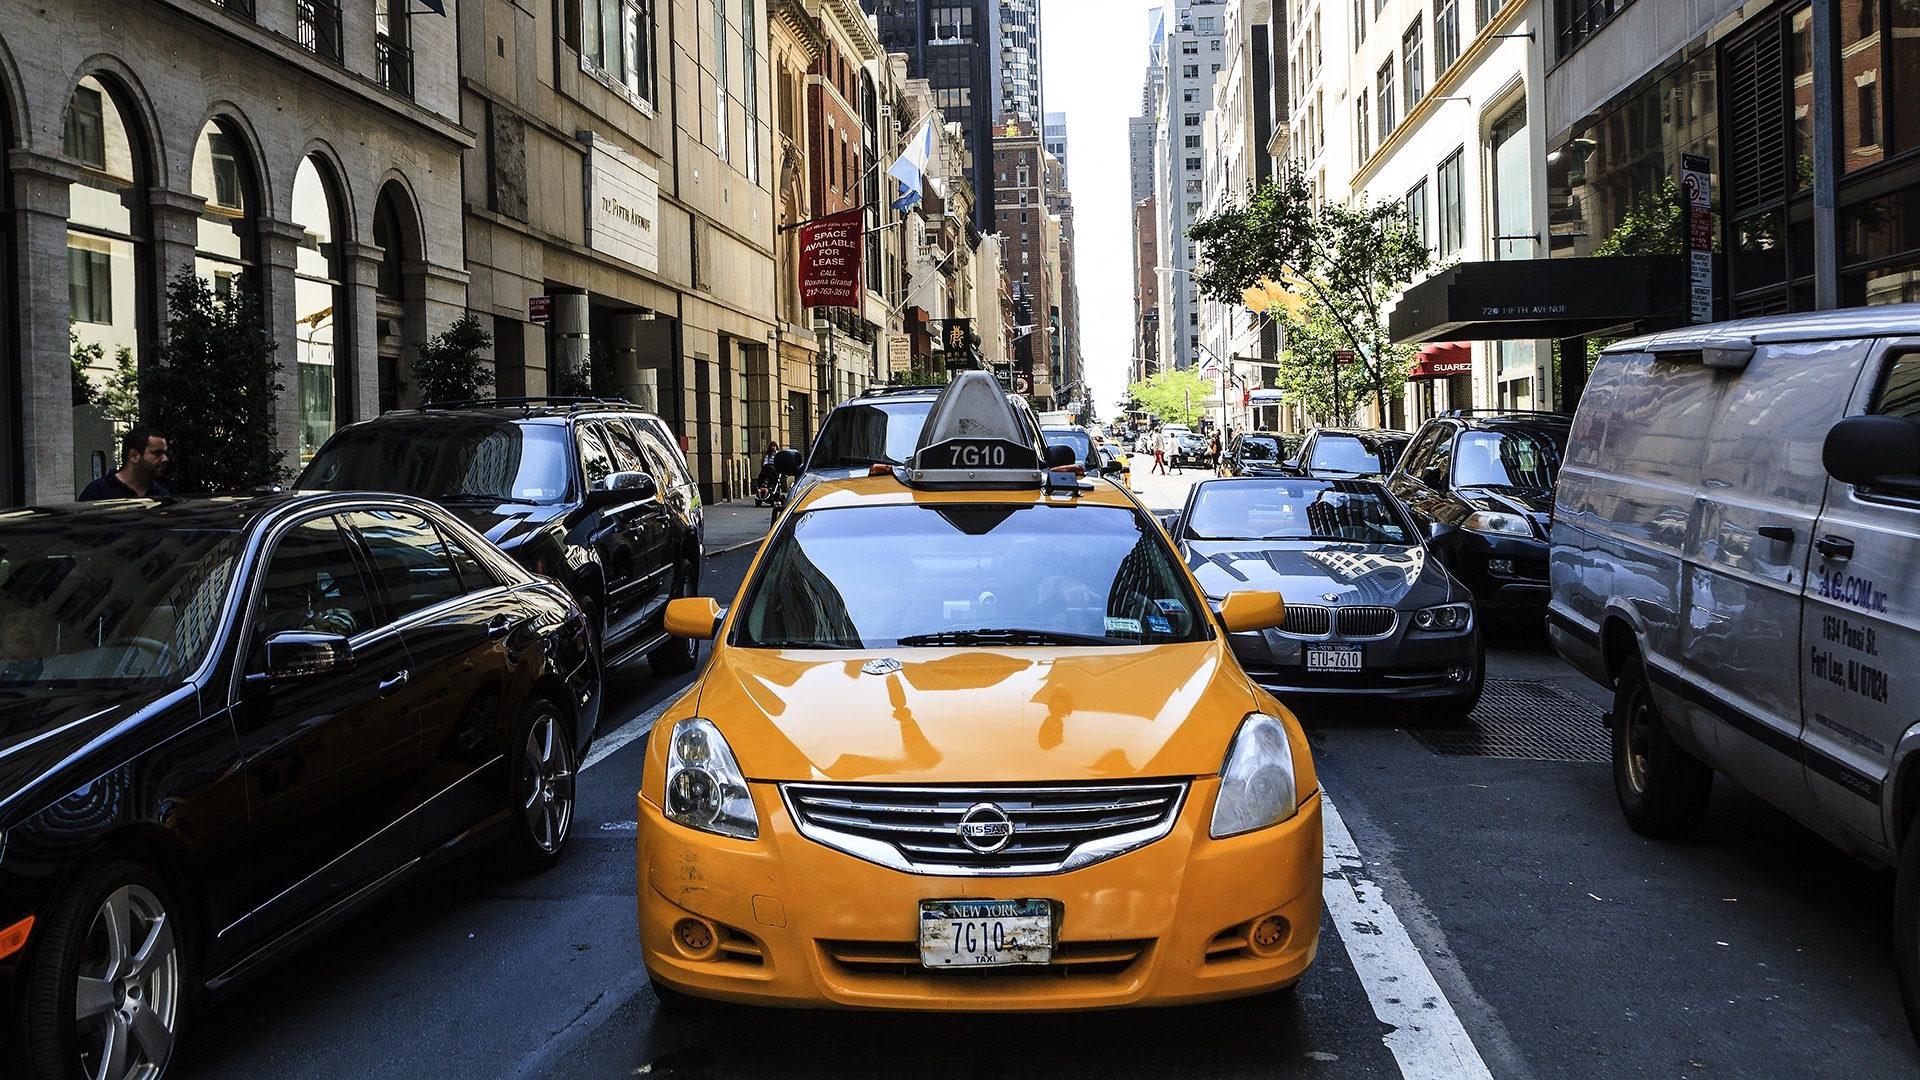 taxi, New york, Città, Apple, America - Sfondi HD - Professor-falken.com